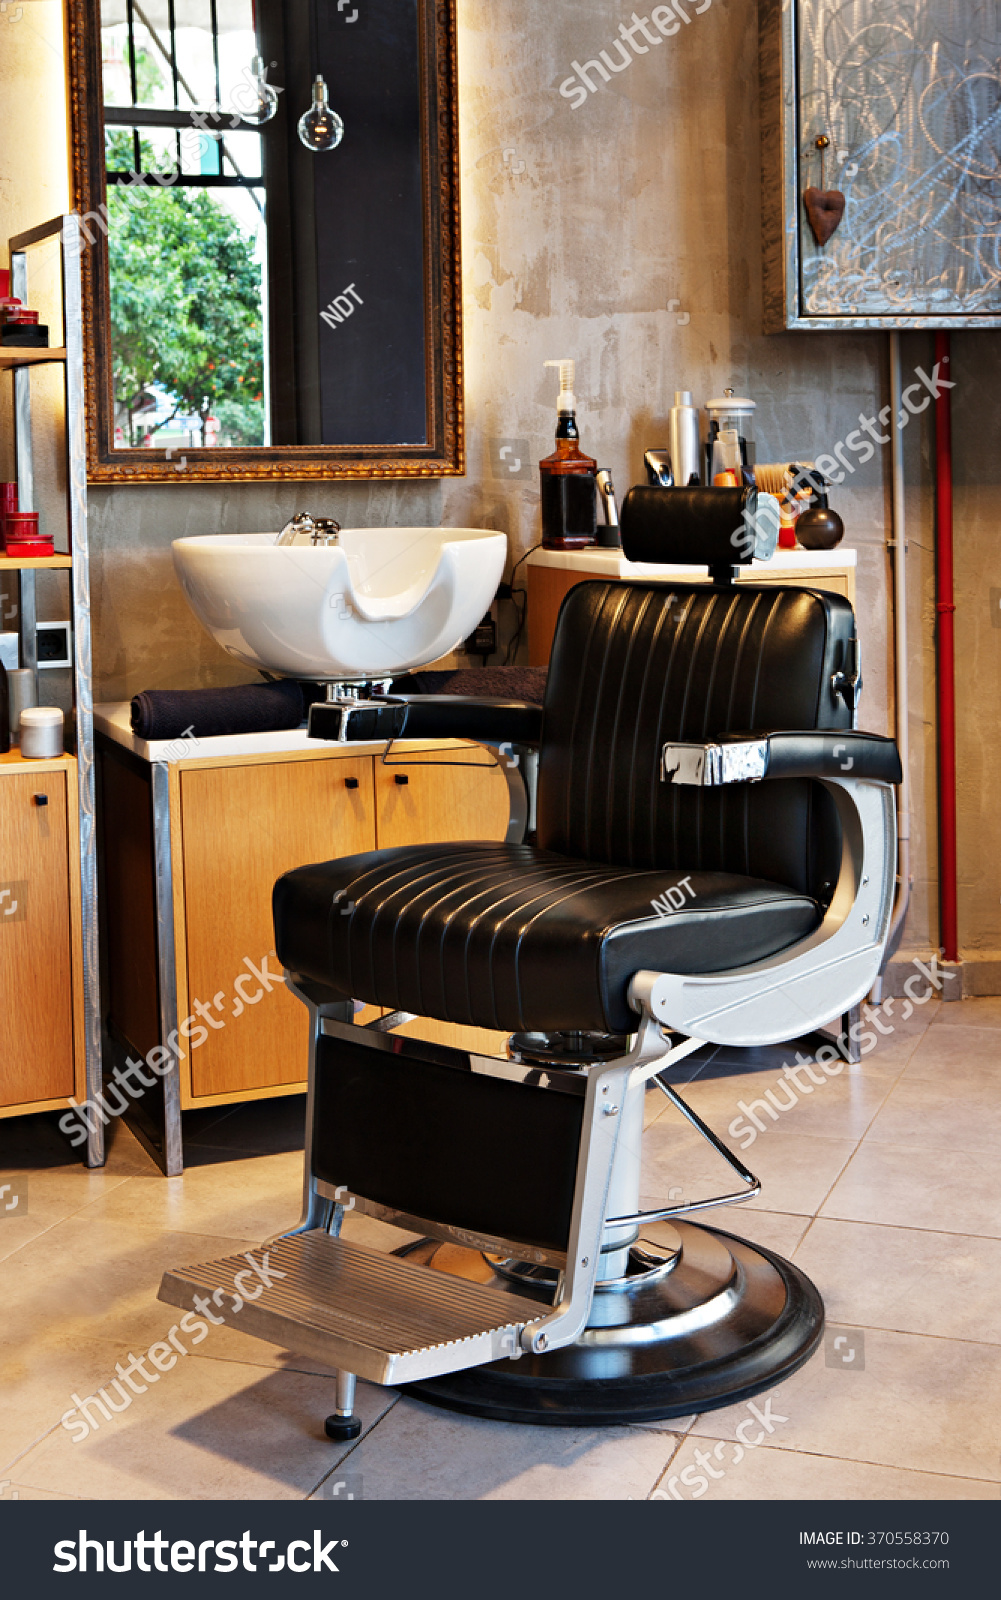 Barber shop interior very stylish very stock photo 370558370 shutterstock - Barber shop interior ...